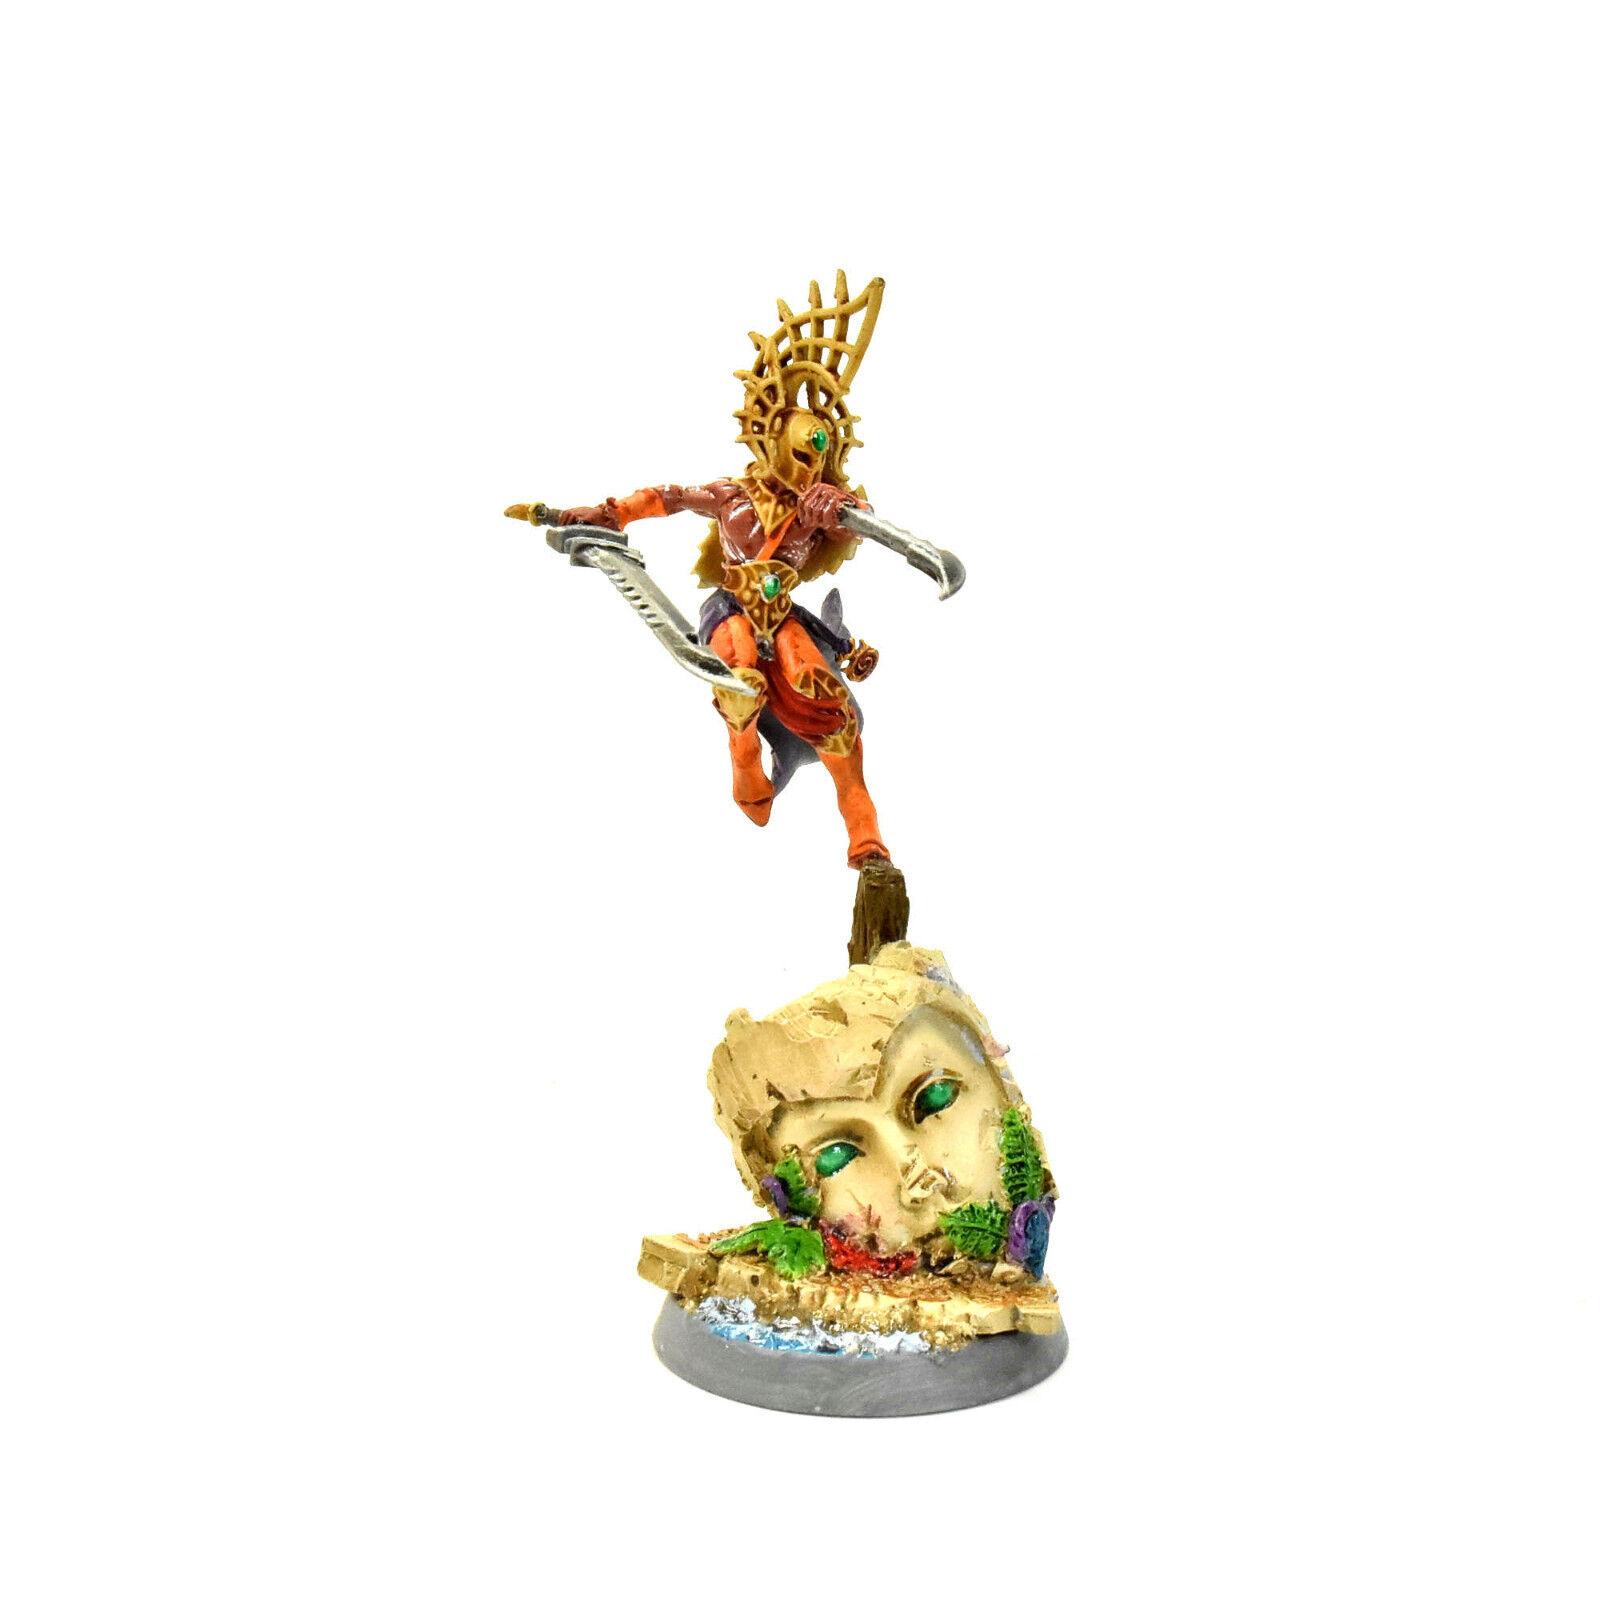 Idoneth deepkin gran rey converdeido Pro pintado warhammer Edad De Sigmar